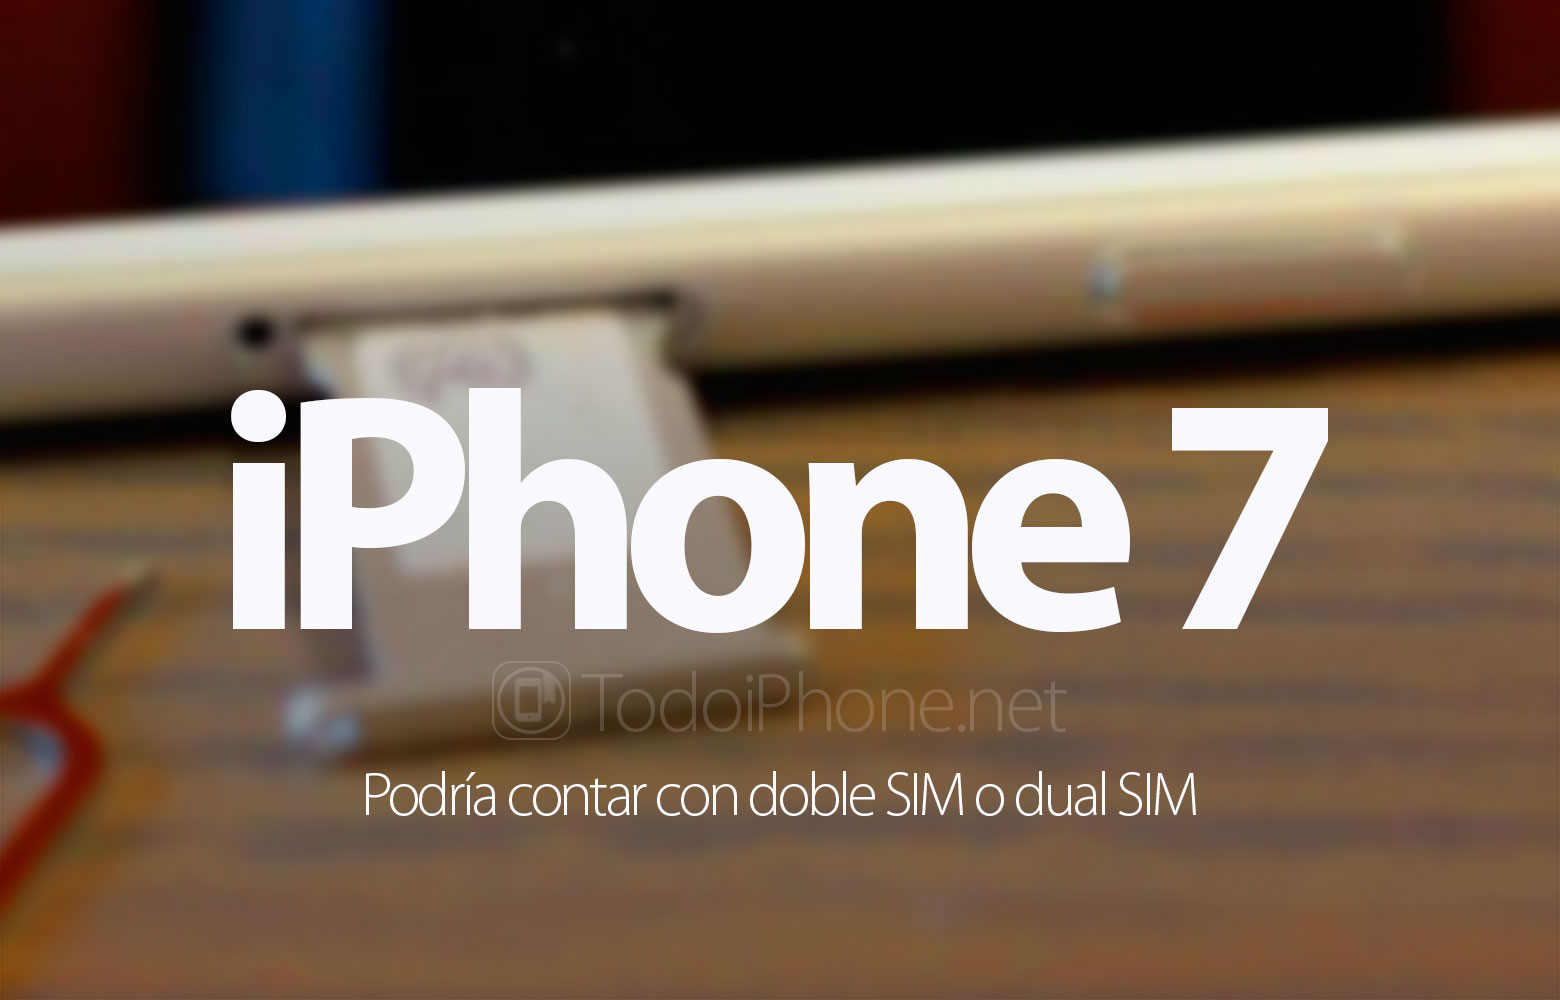 iphone-7-podria-contar-doble-sim